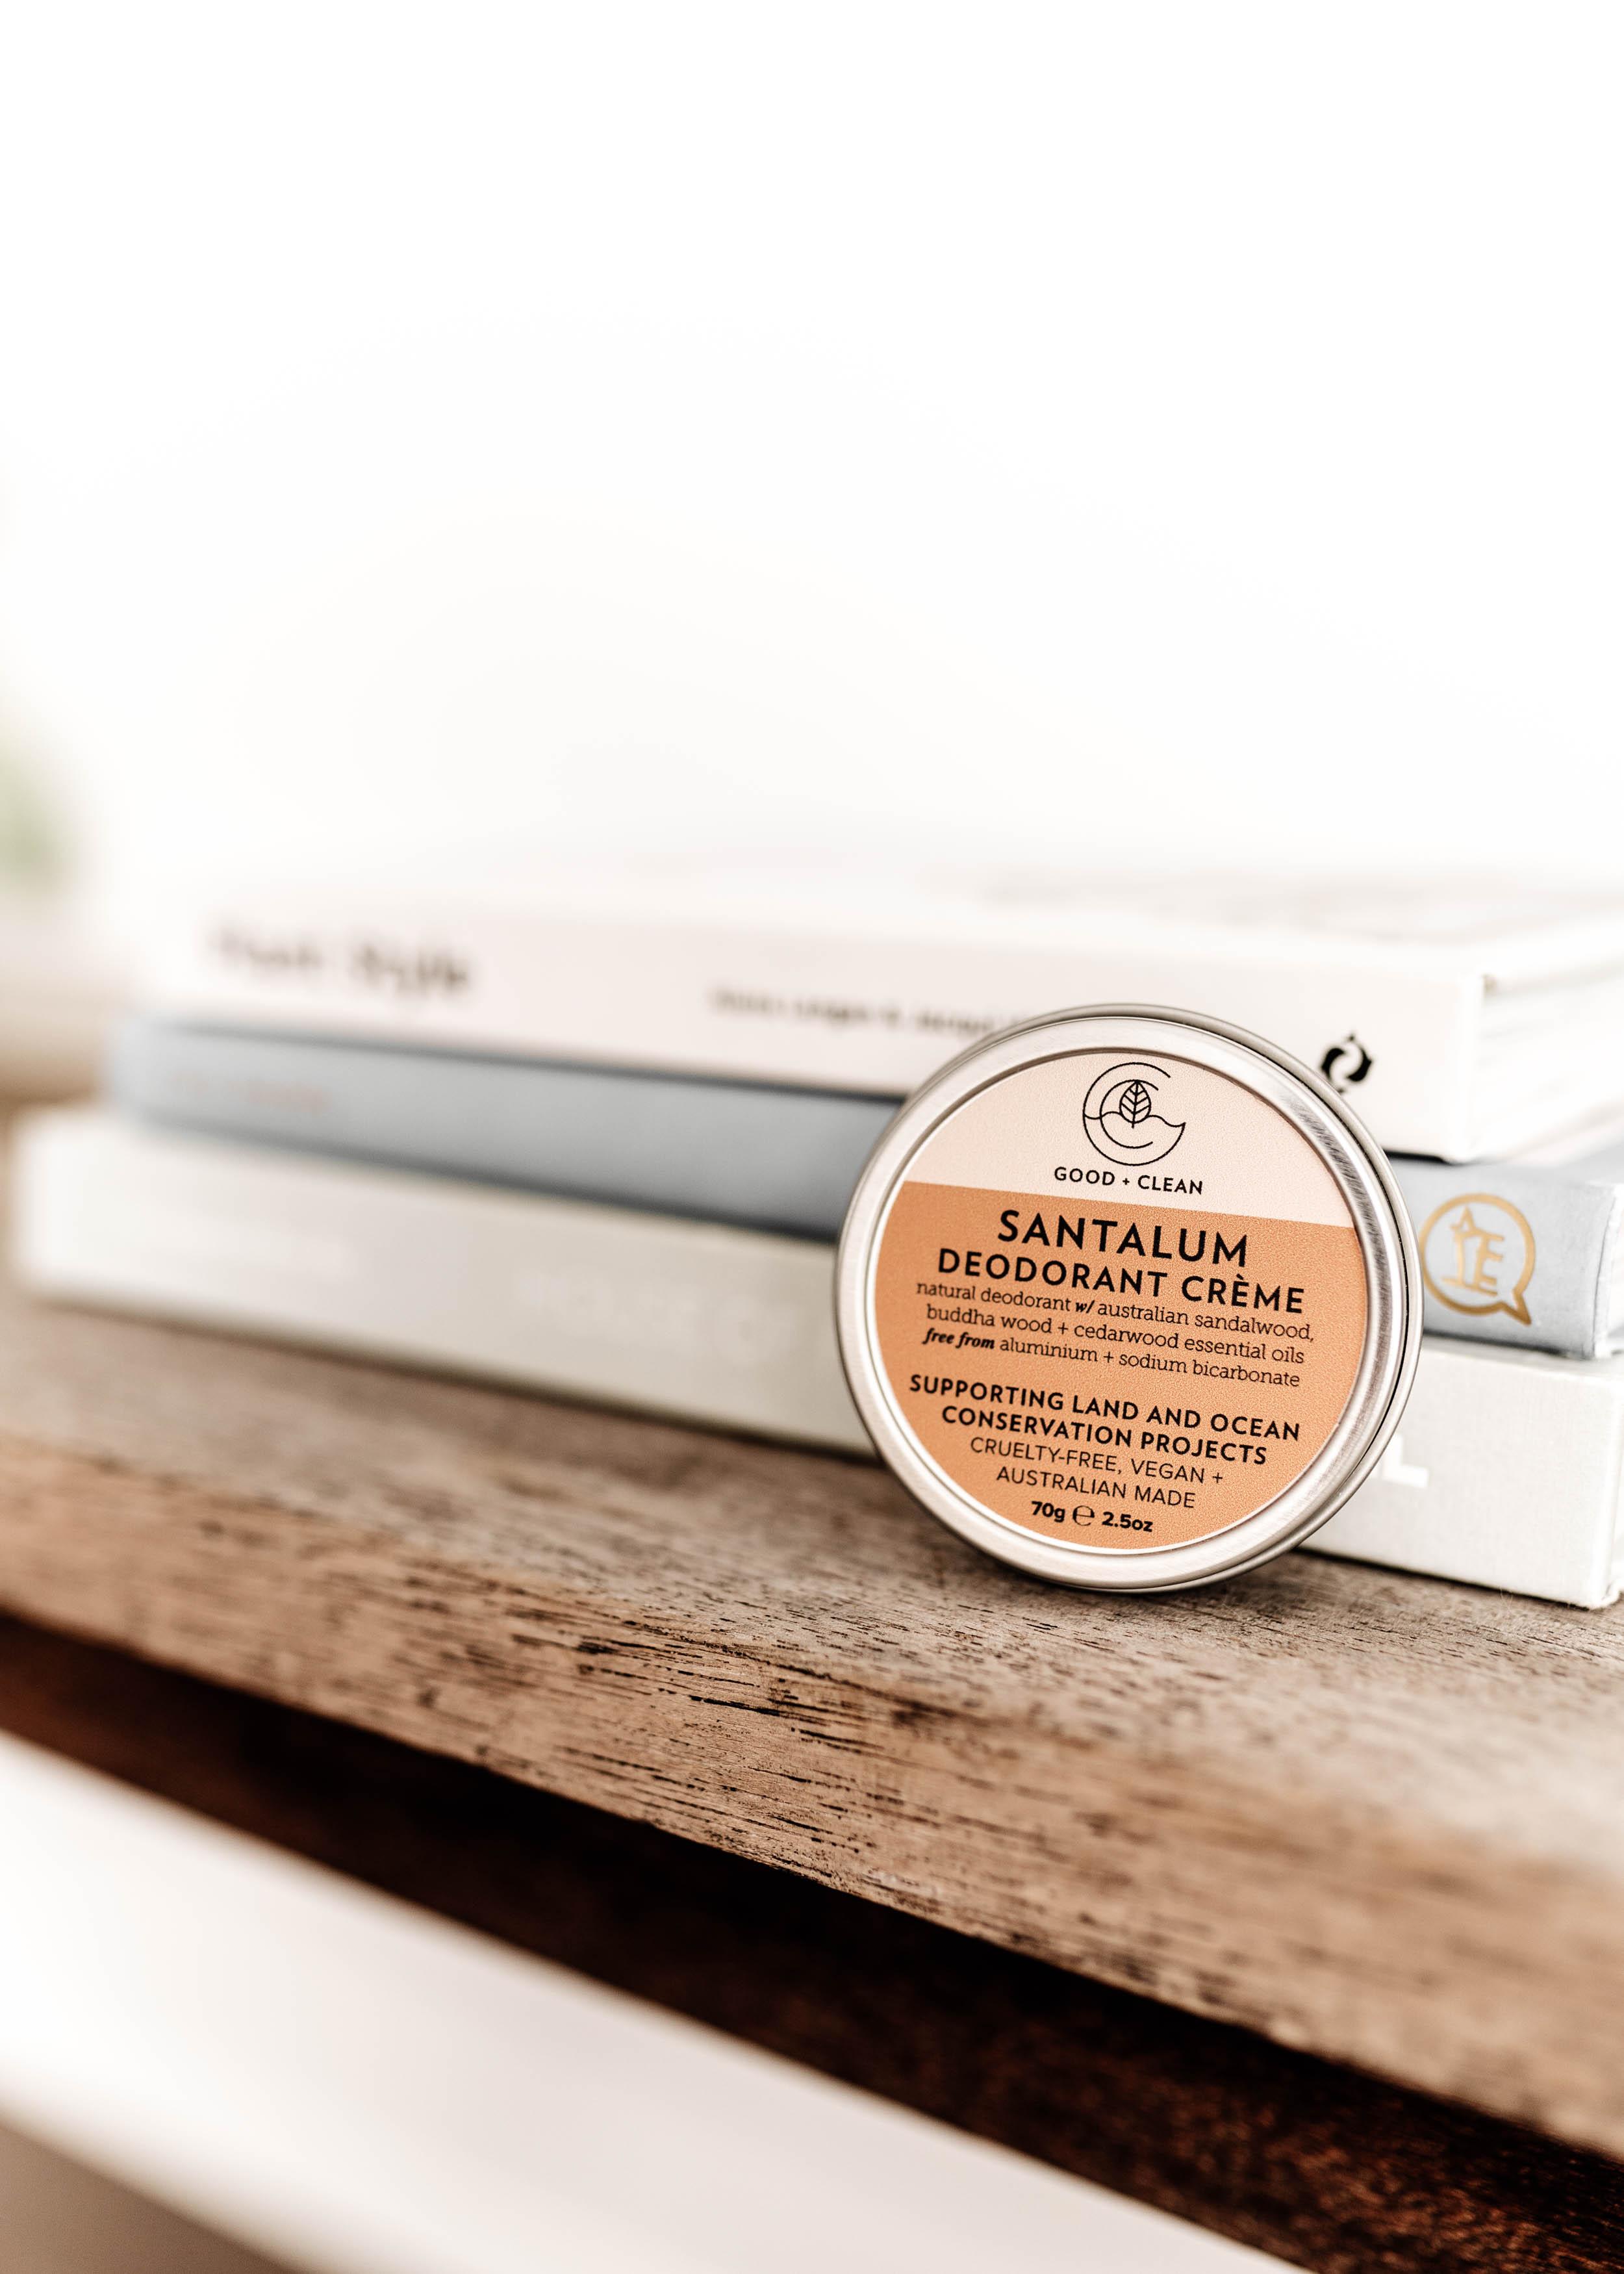 keira-mason-good-and-clean-deodorant-books.jpg